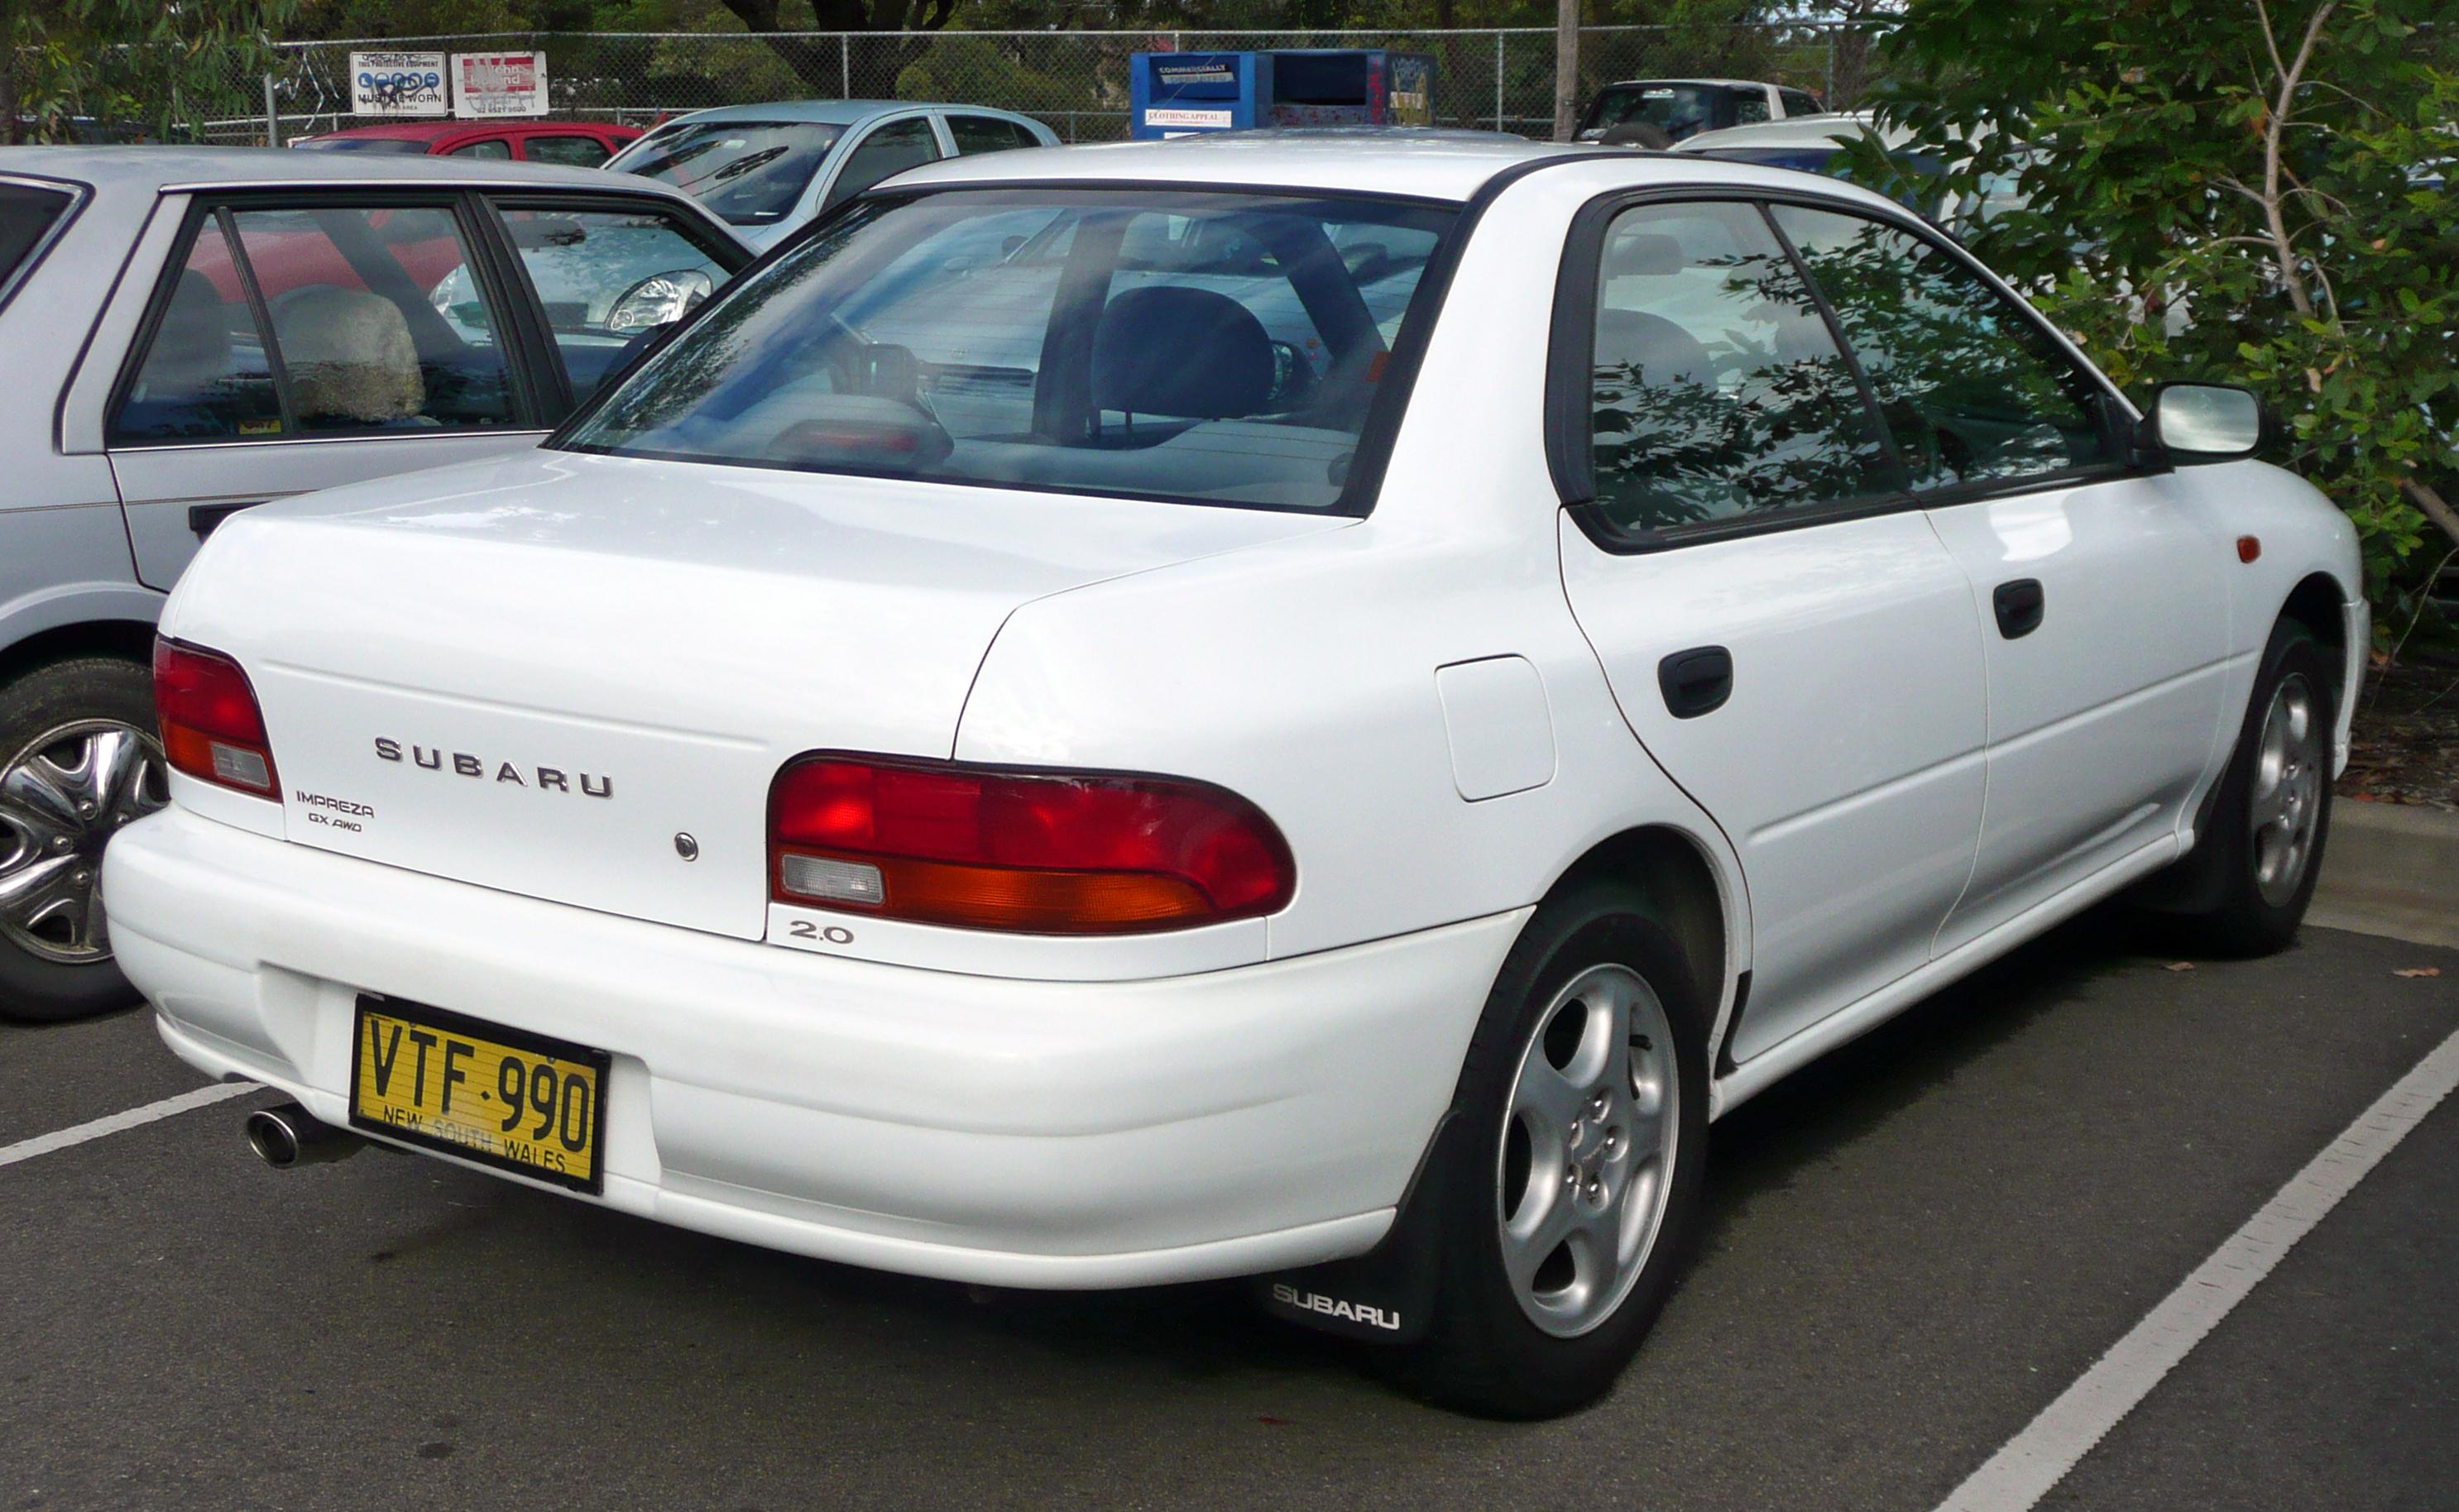 file:1998 subaru impreza (gc8 my99) gx awd sedan (2010-05-19)